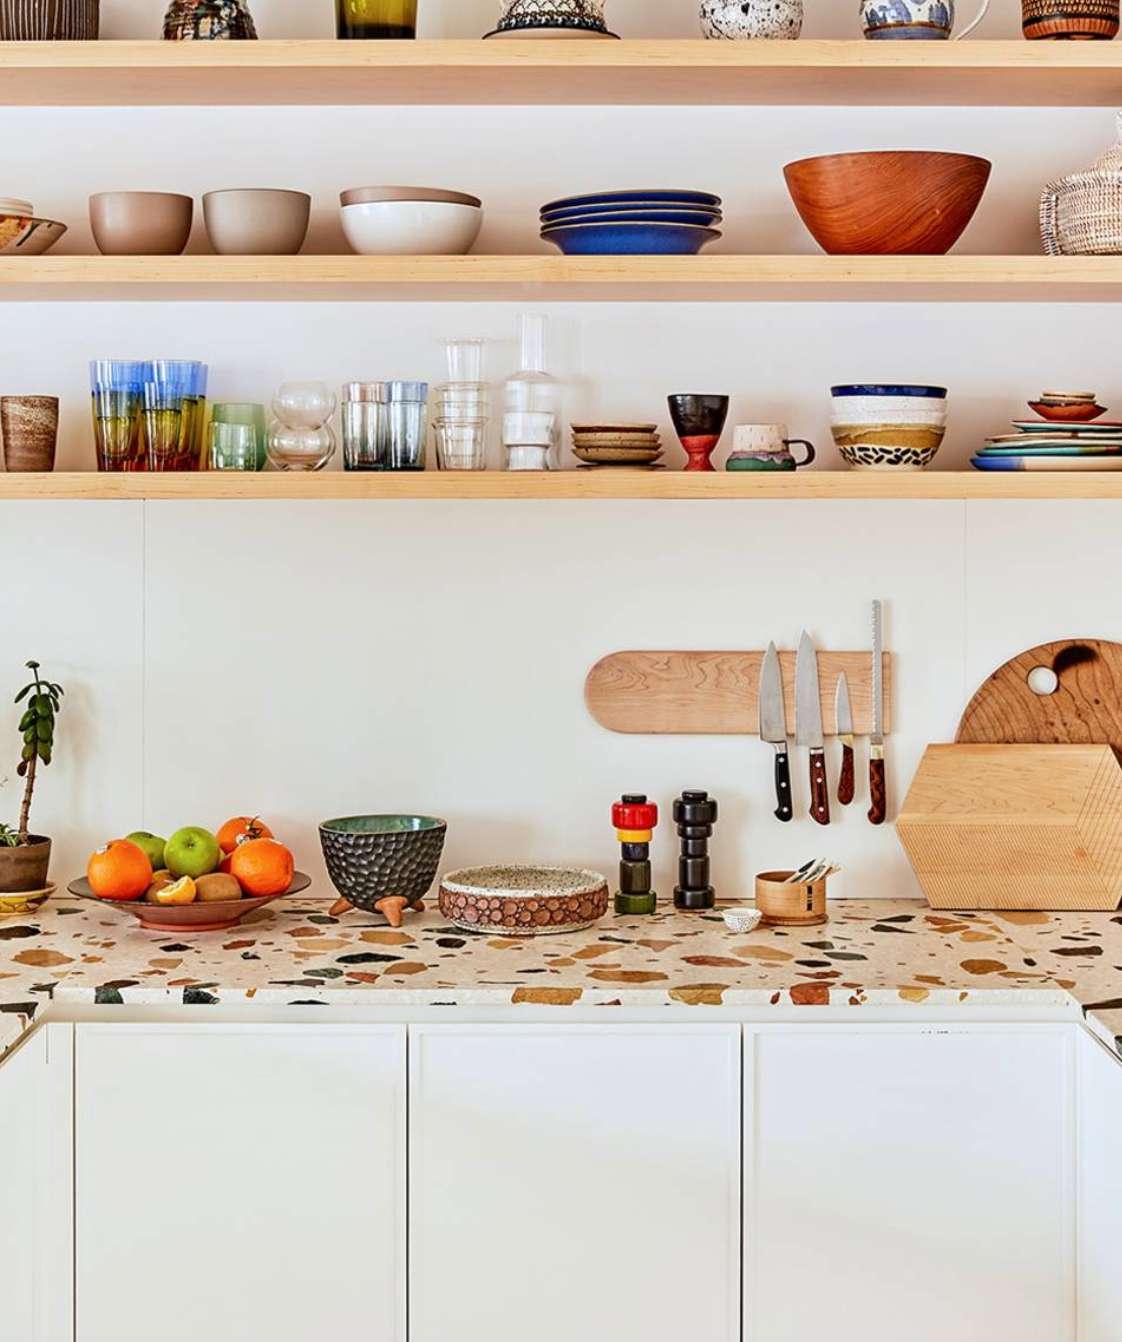 Kitchen with terrazzo tile